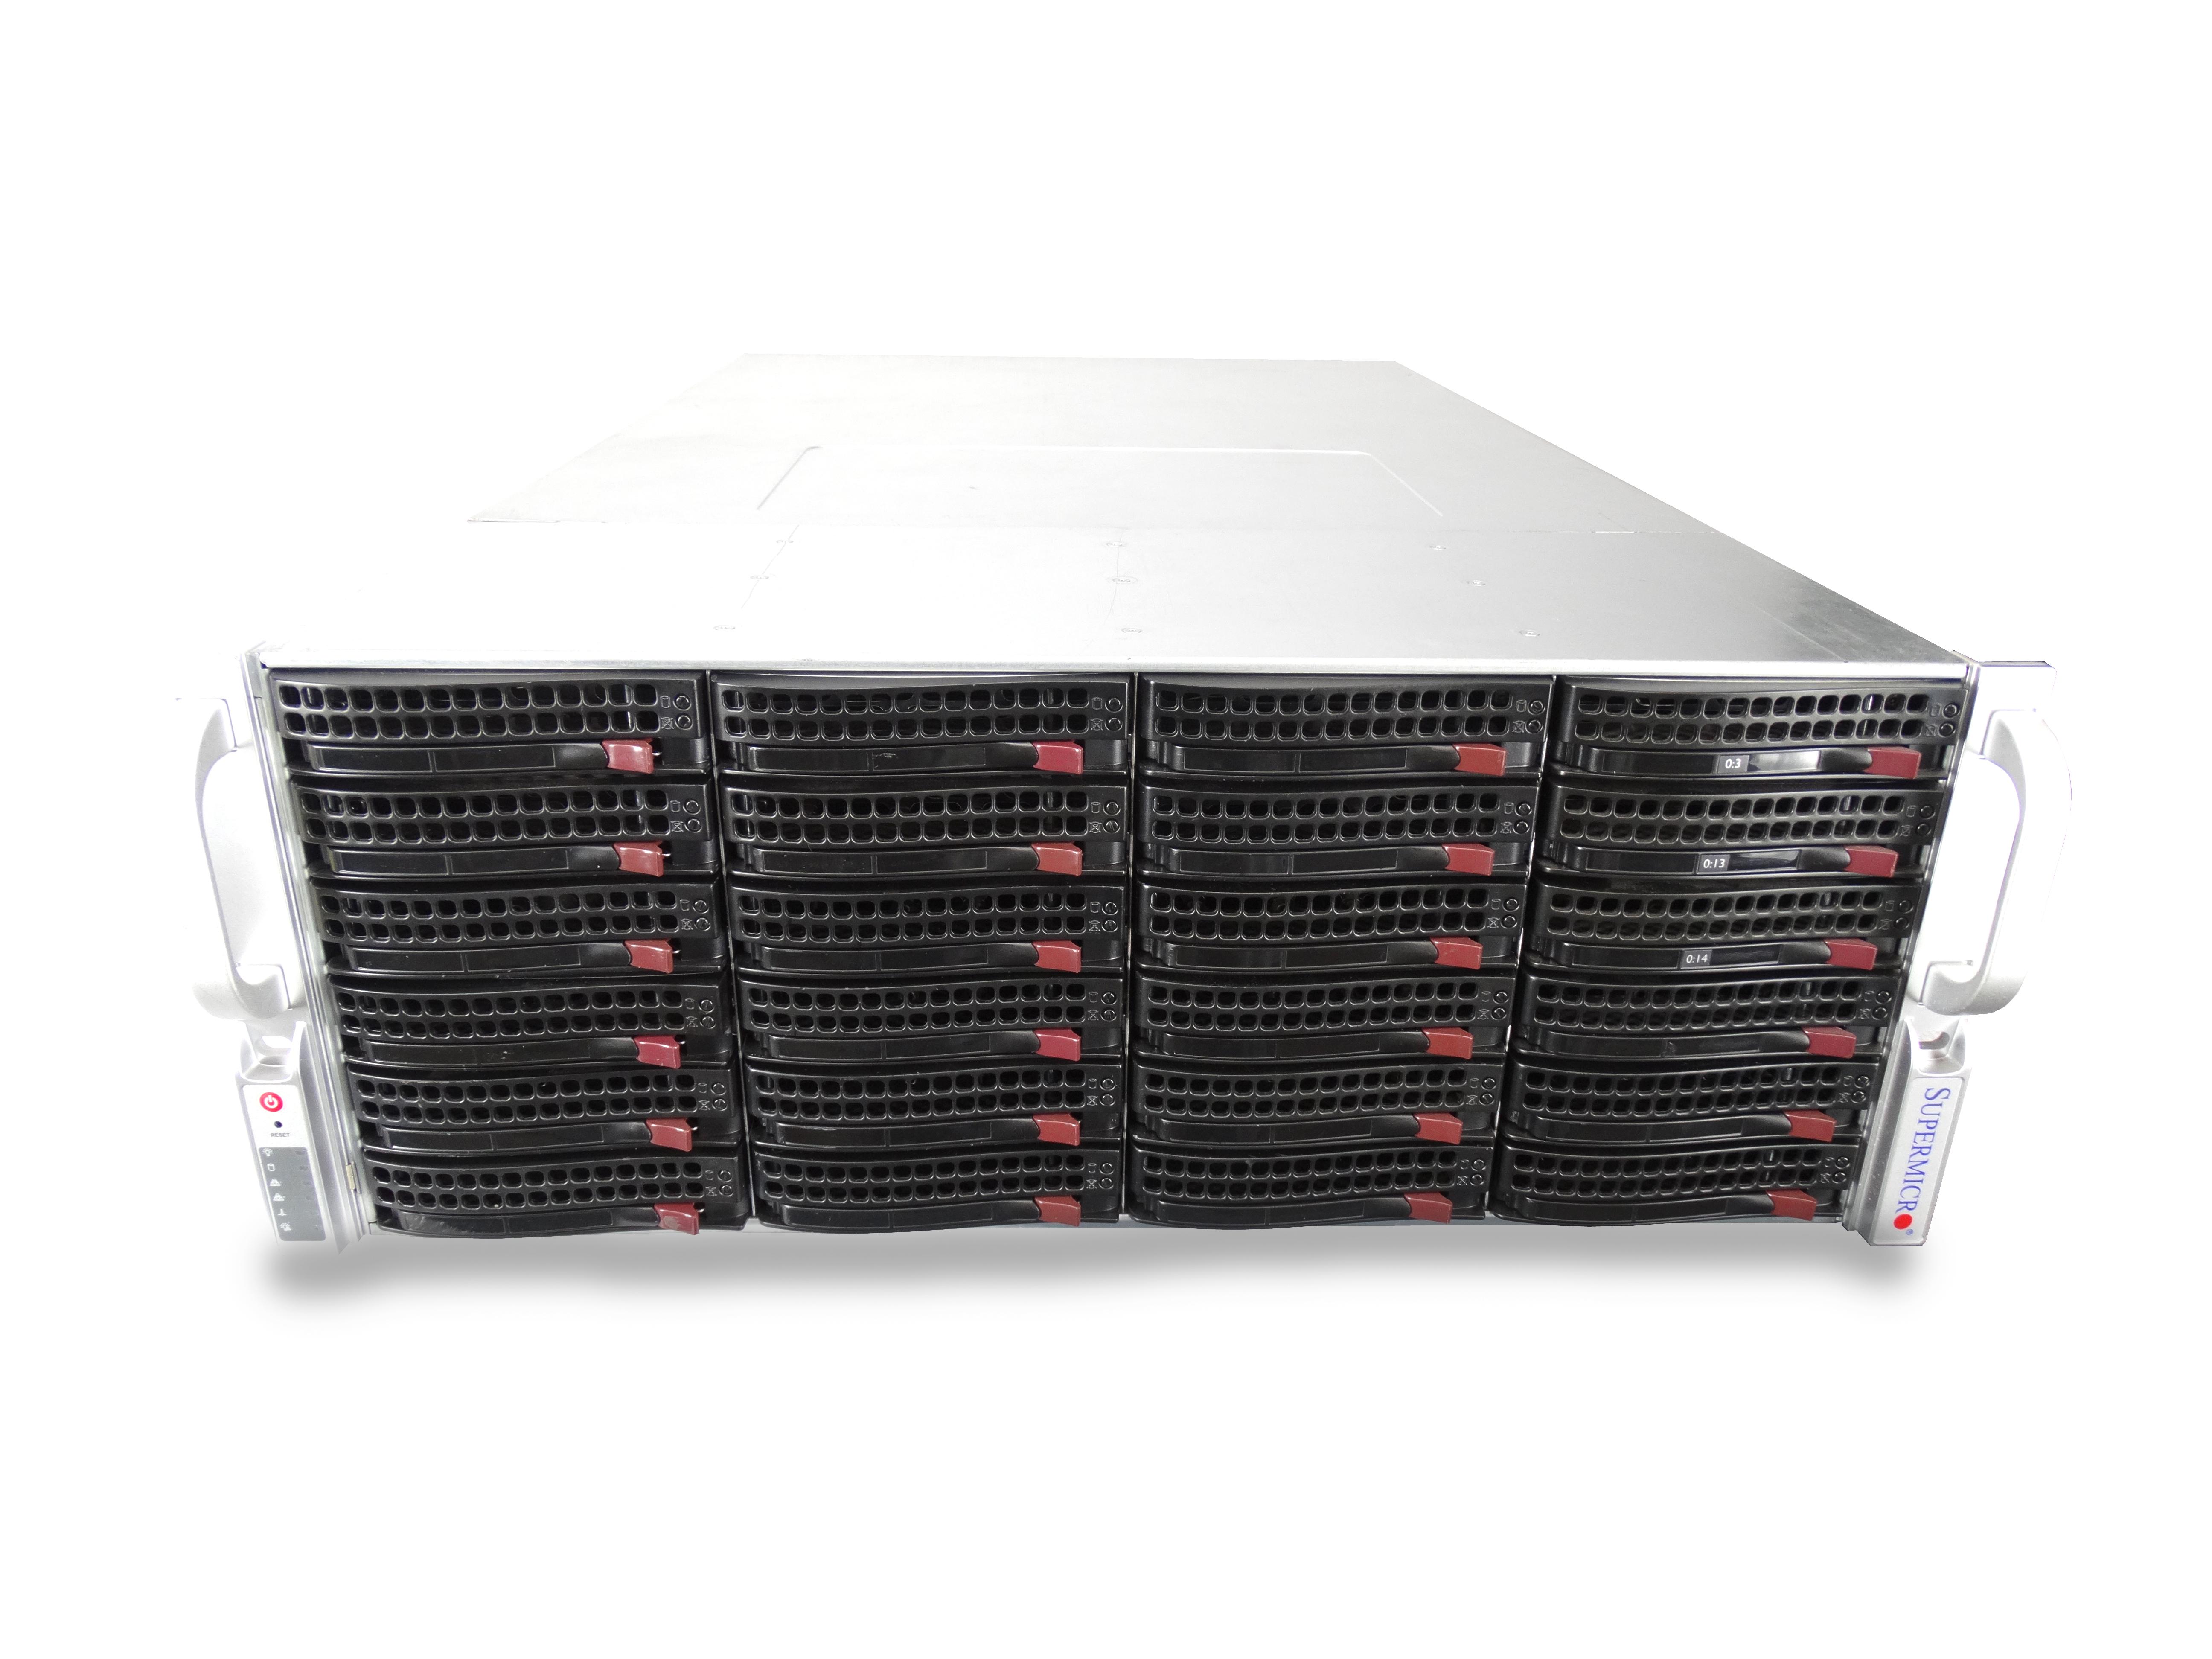 Supermicro SuperServer 6047R-E1R36N 36-Bay LFF 4U Rackmount Server